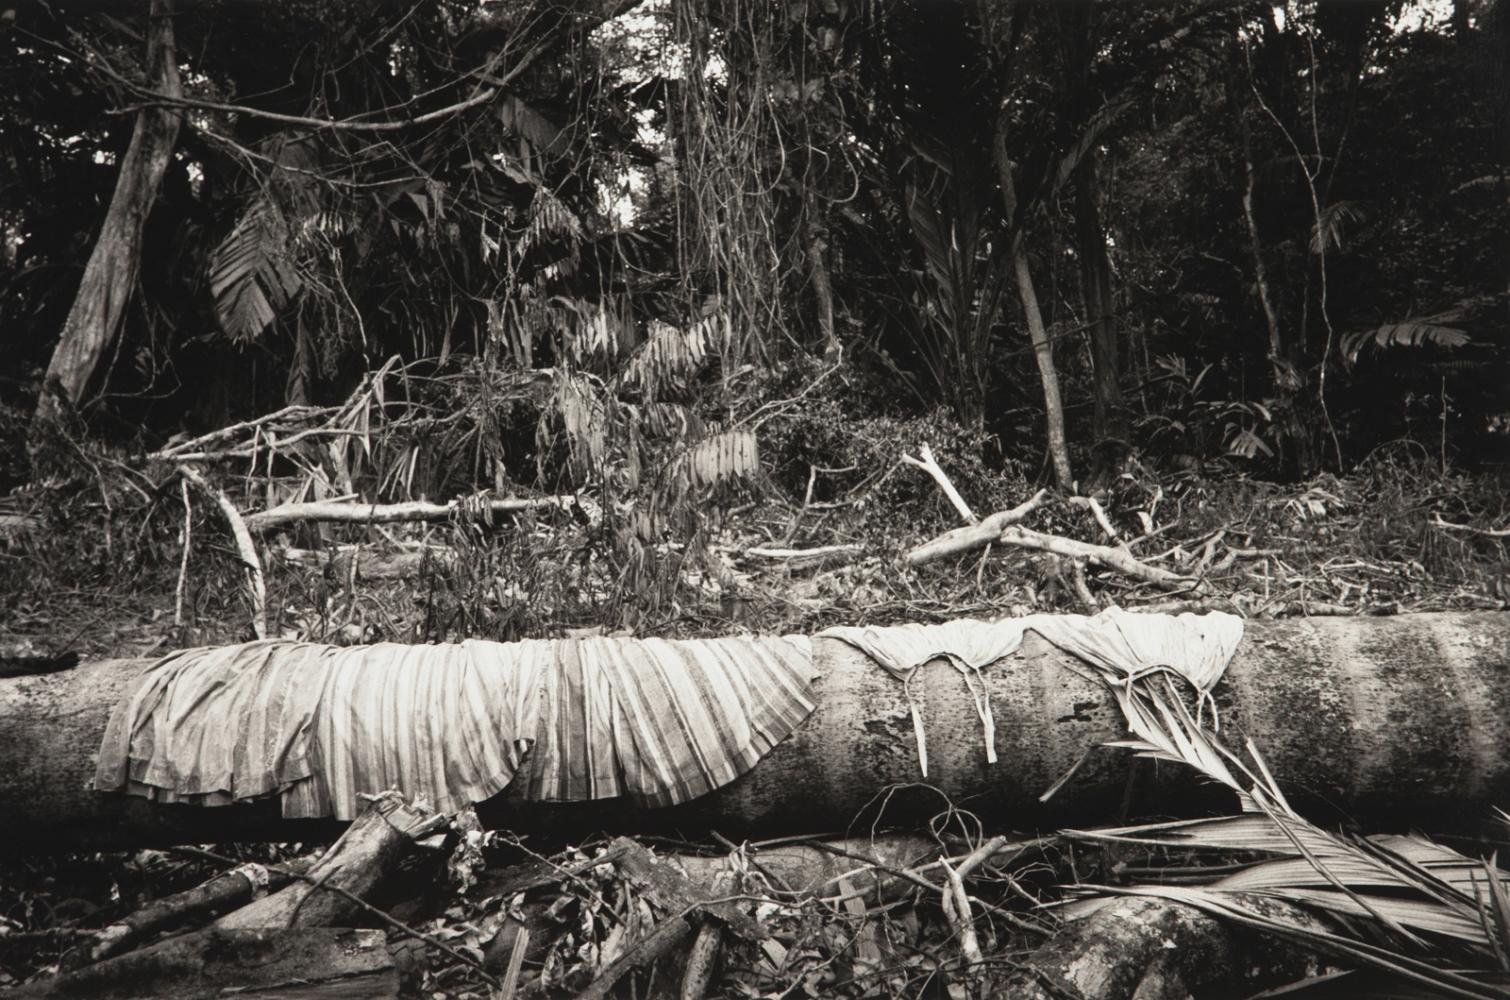 Art and Documentary Photography - Loading WEB_Waniku_AndreaSantolaya-12.jpg